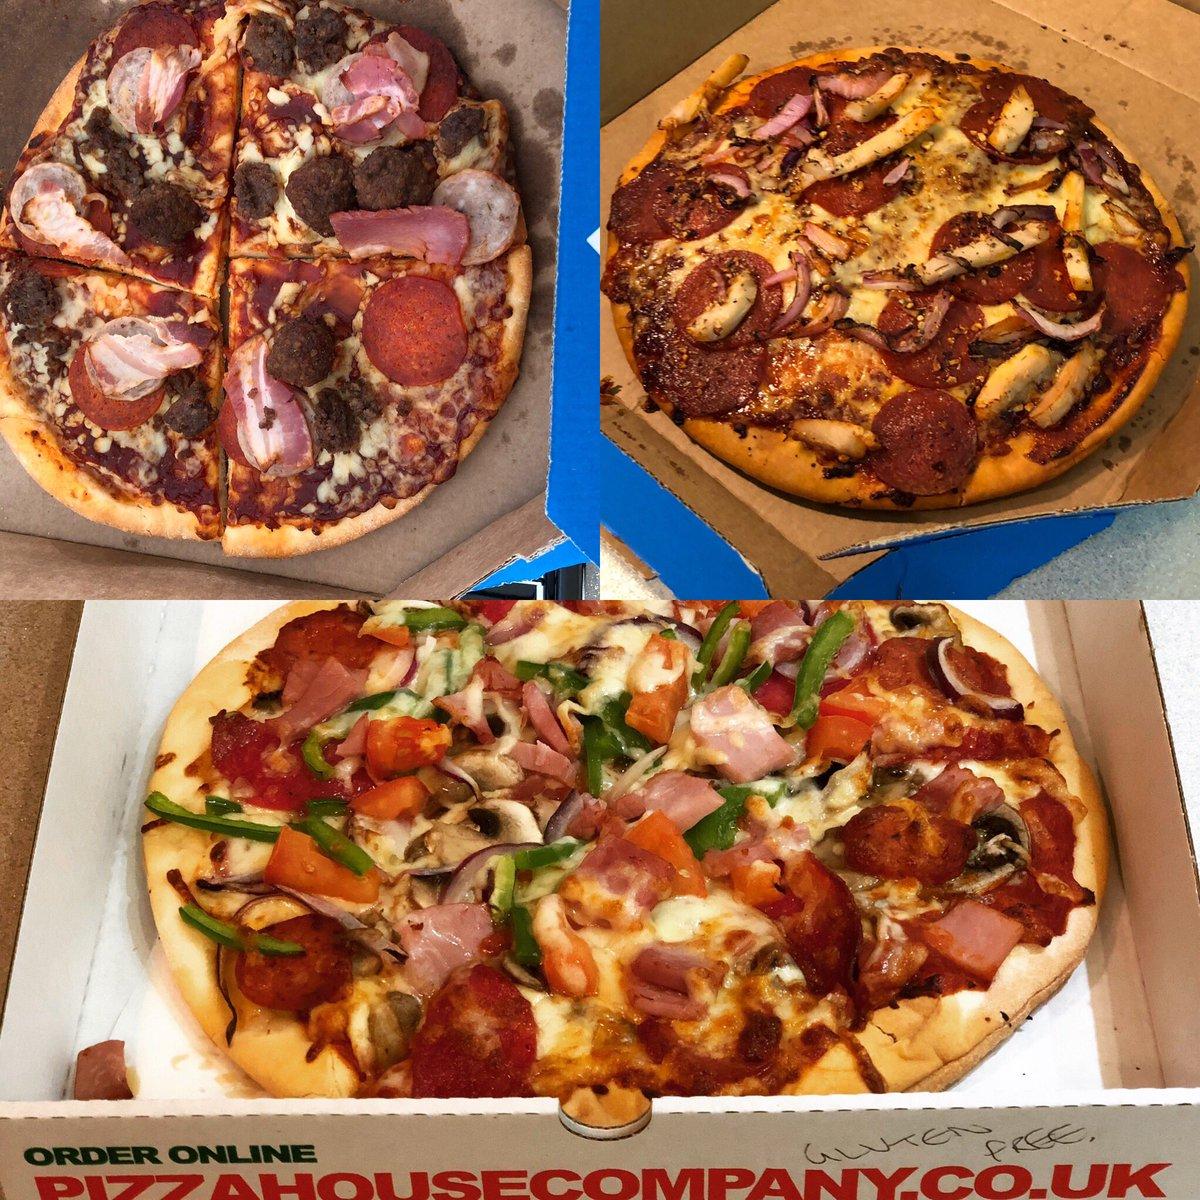 Domino's Pizza UK on Twitter: